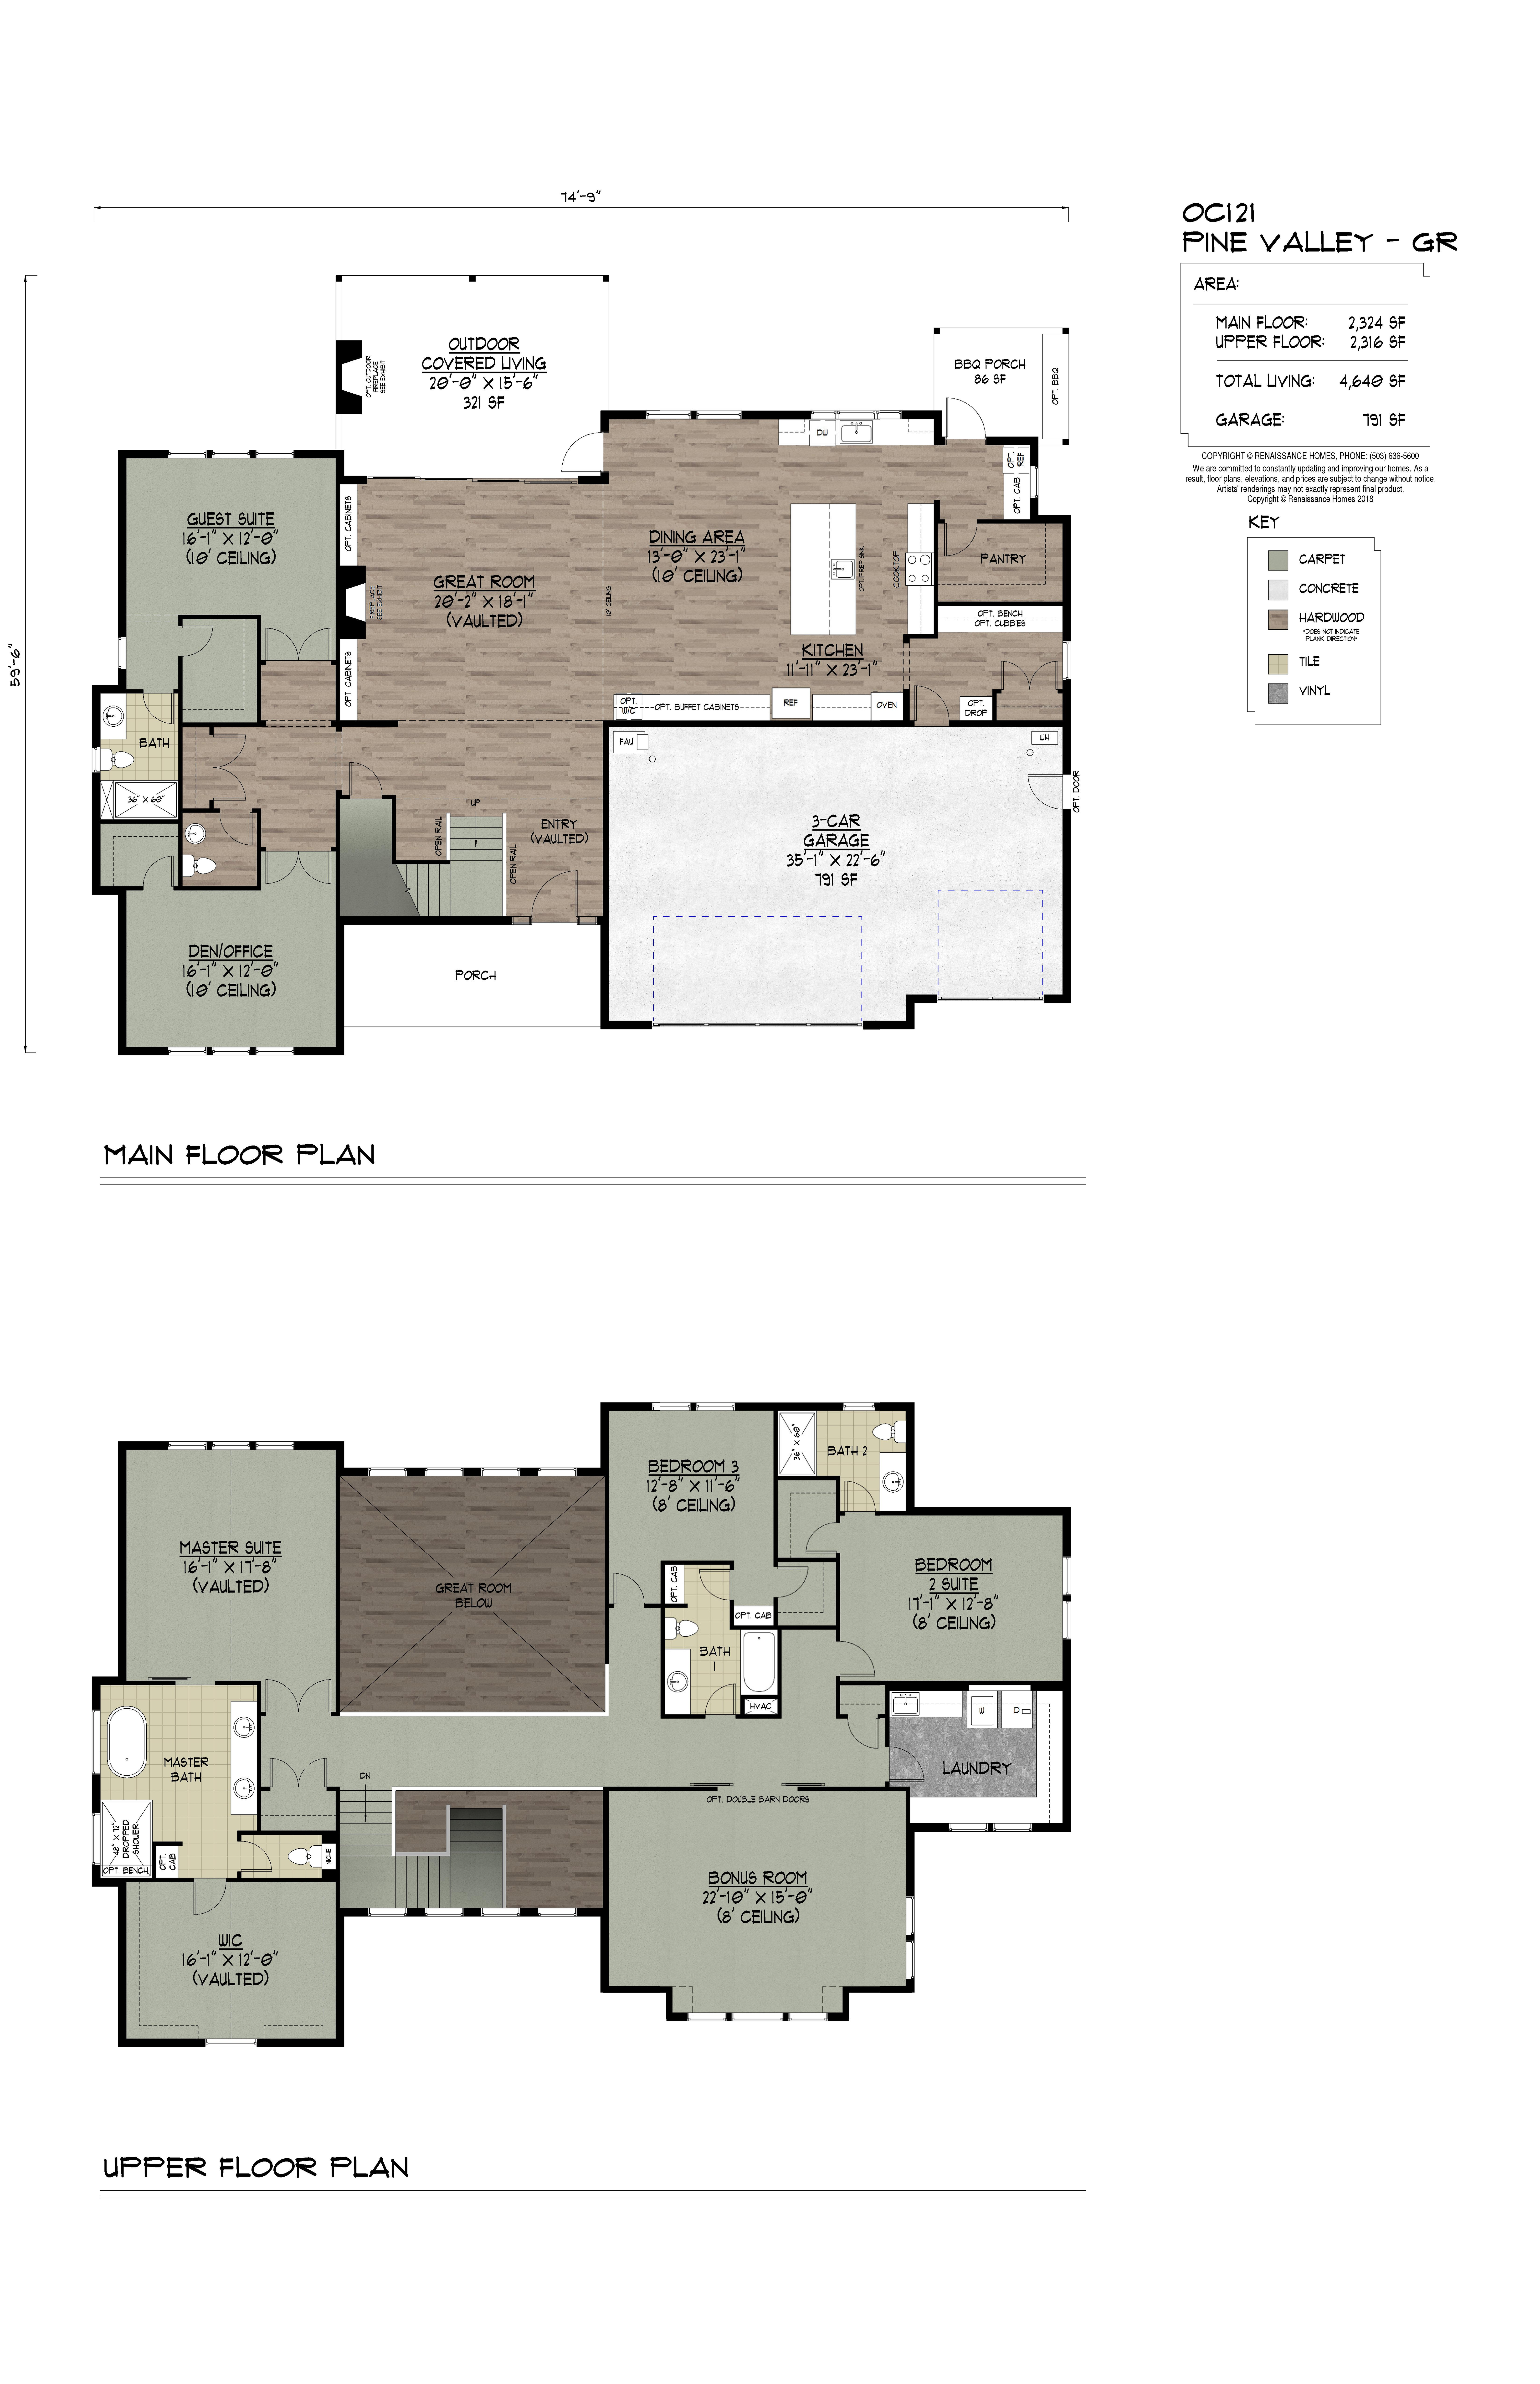 1263 Pine Valley Road Floorplan